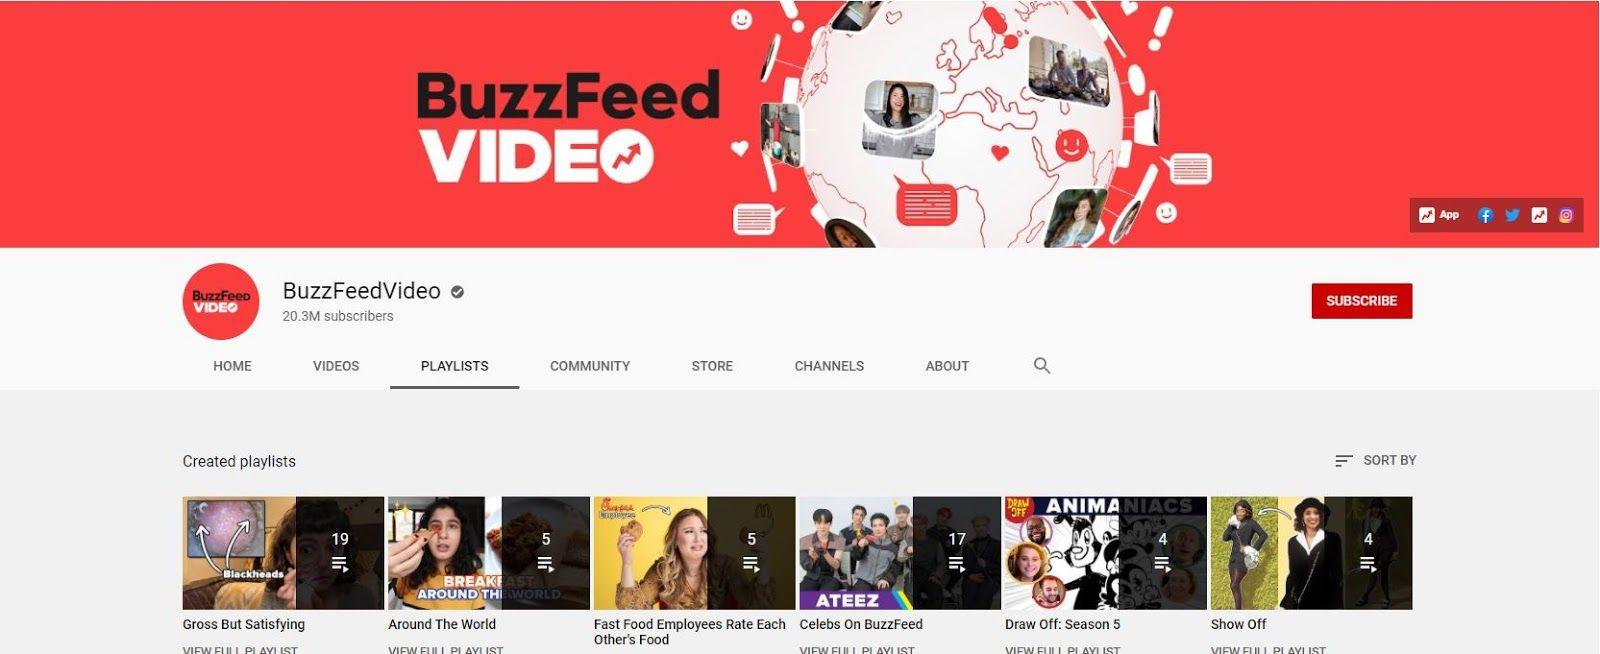 buzzfeed youtube influencers